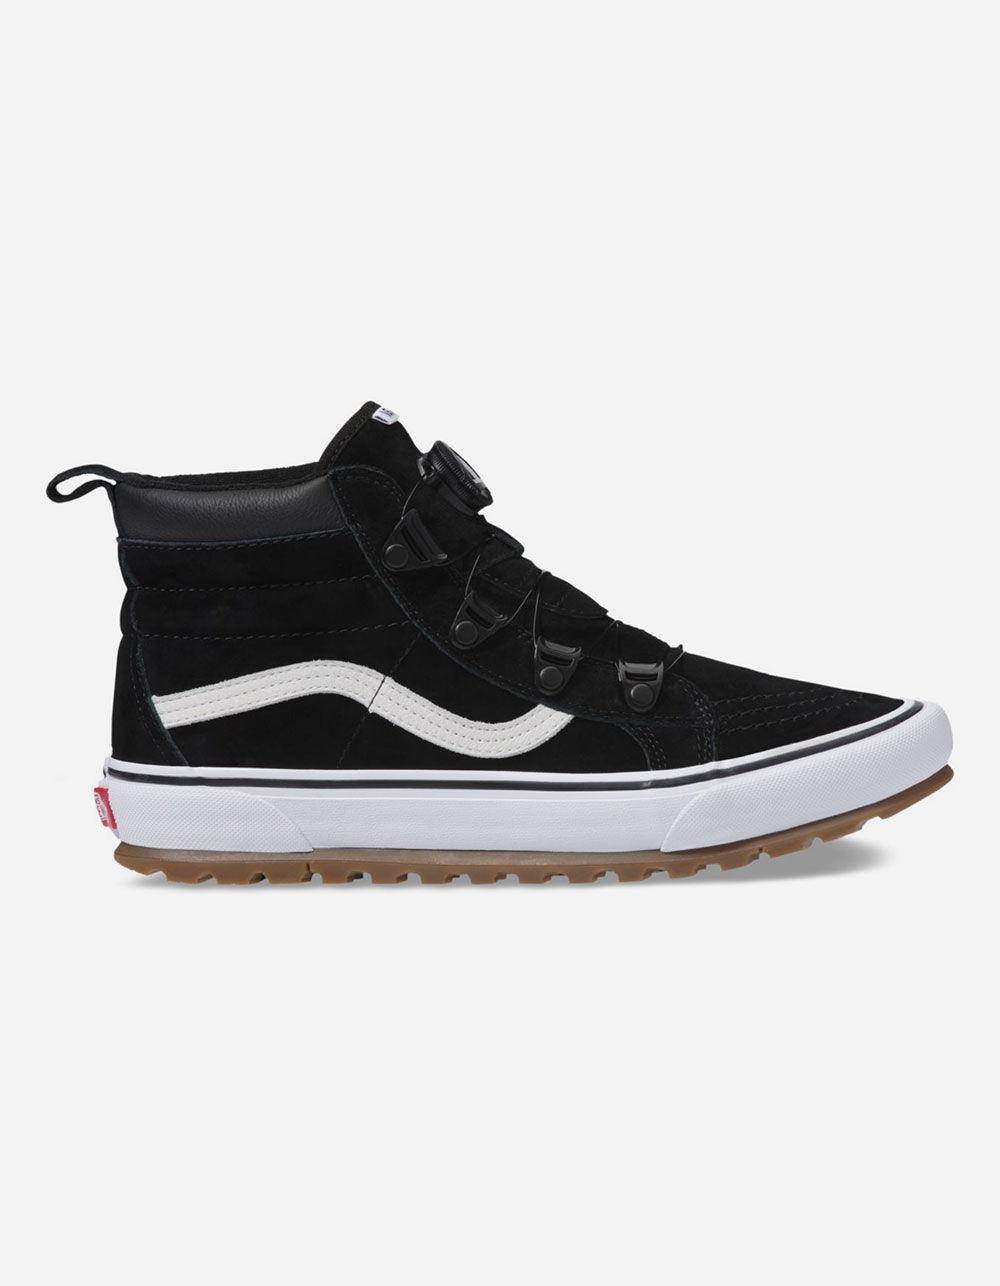 4bc7c219786cde Lyst - Vans Sk8-hi Mte Boa Black   True White Shoes in Black for Men